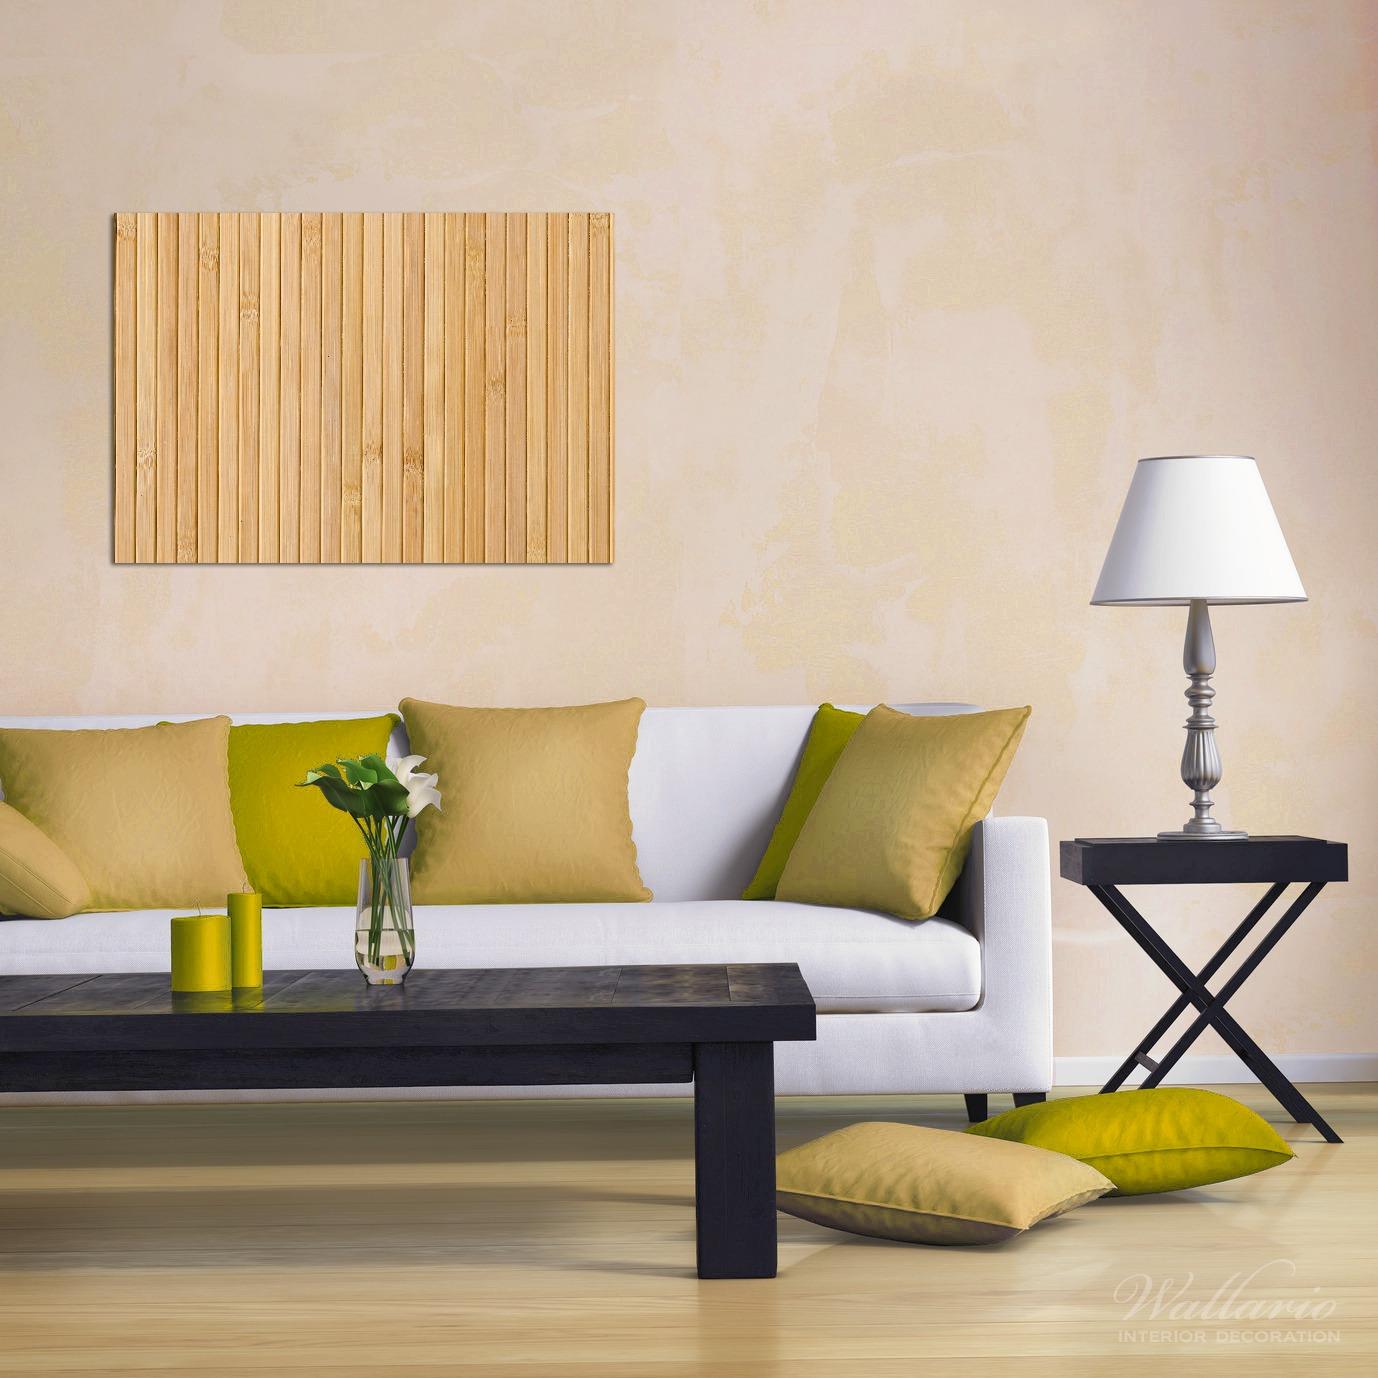 Wandbild Holzpanele hell – Bild 2